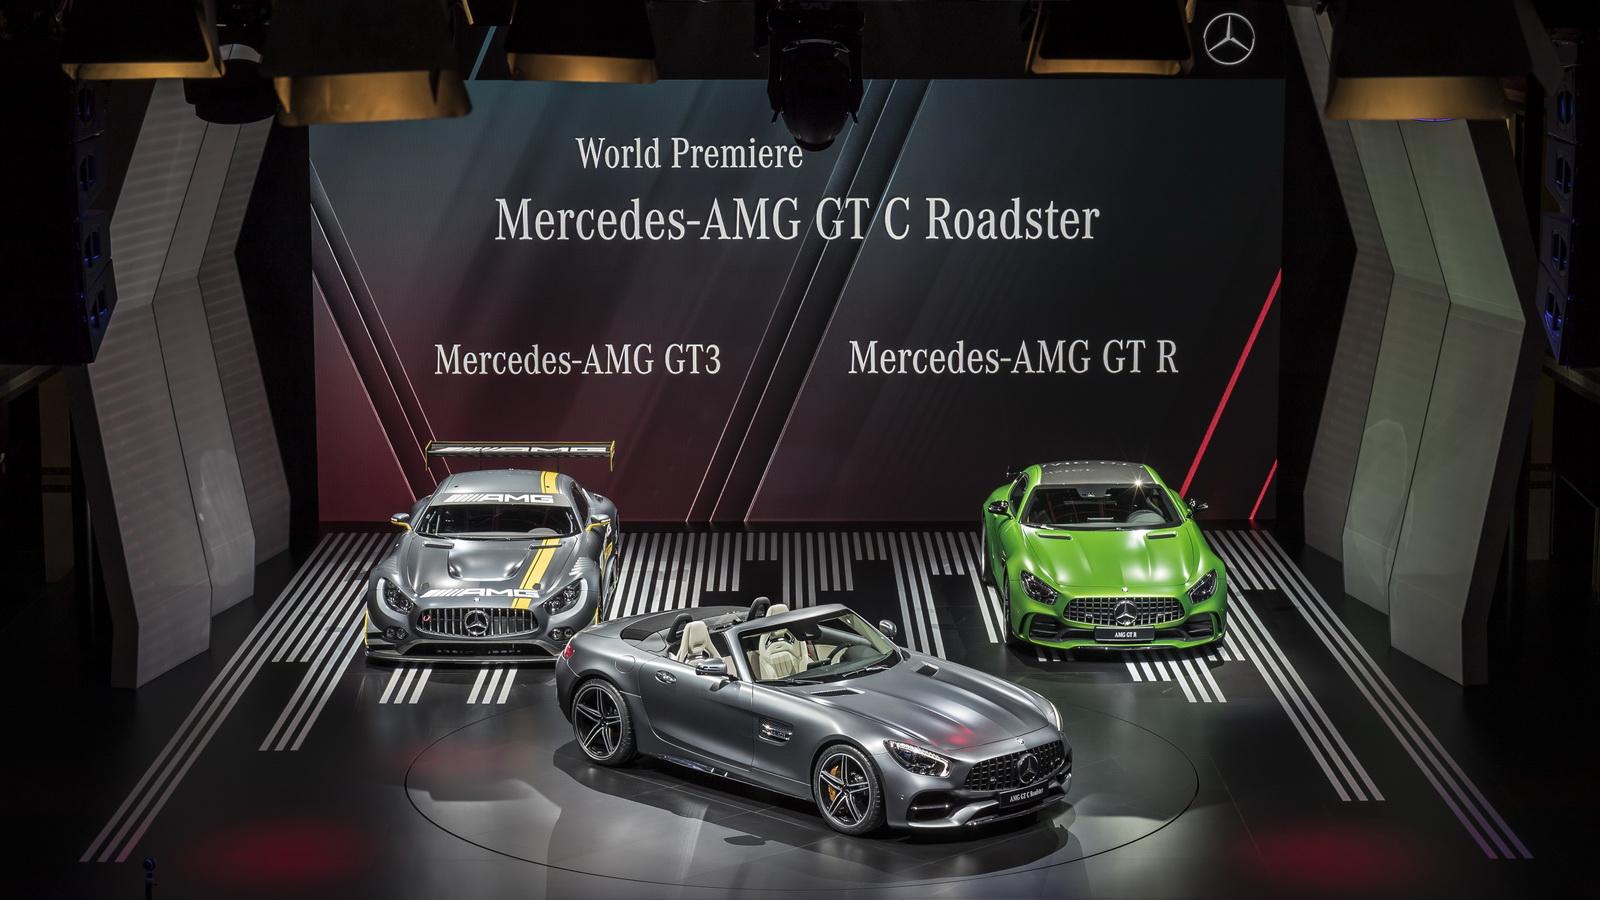 Mercedes-AMG-GTC-Roadster-12